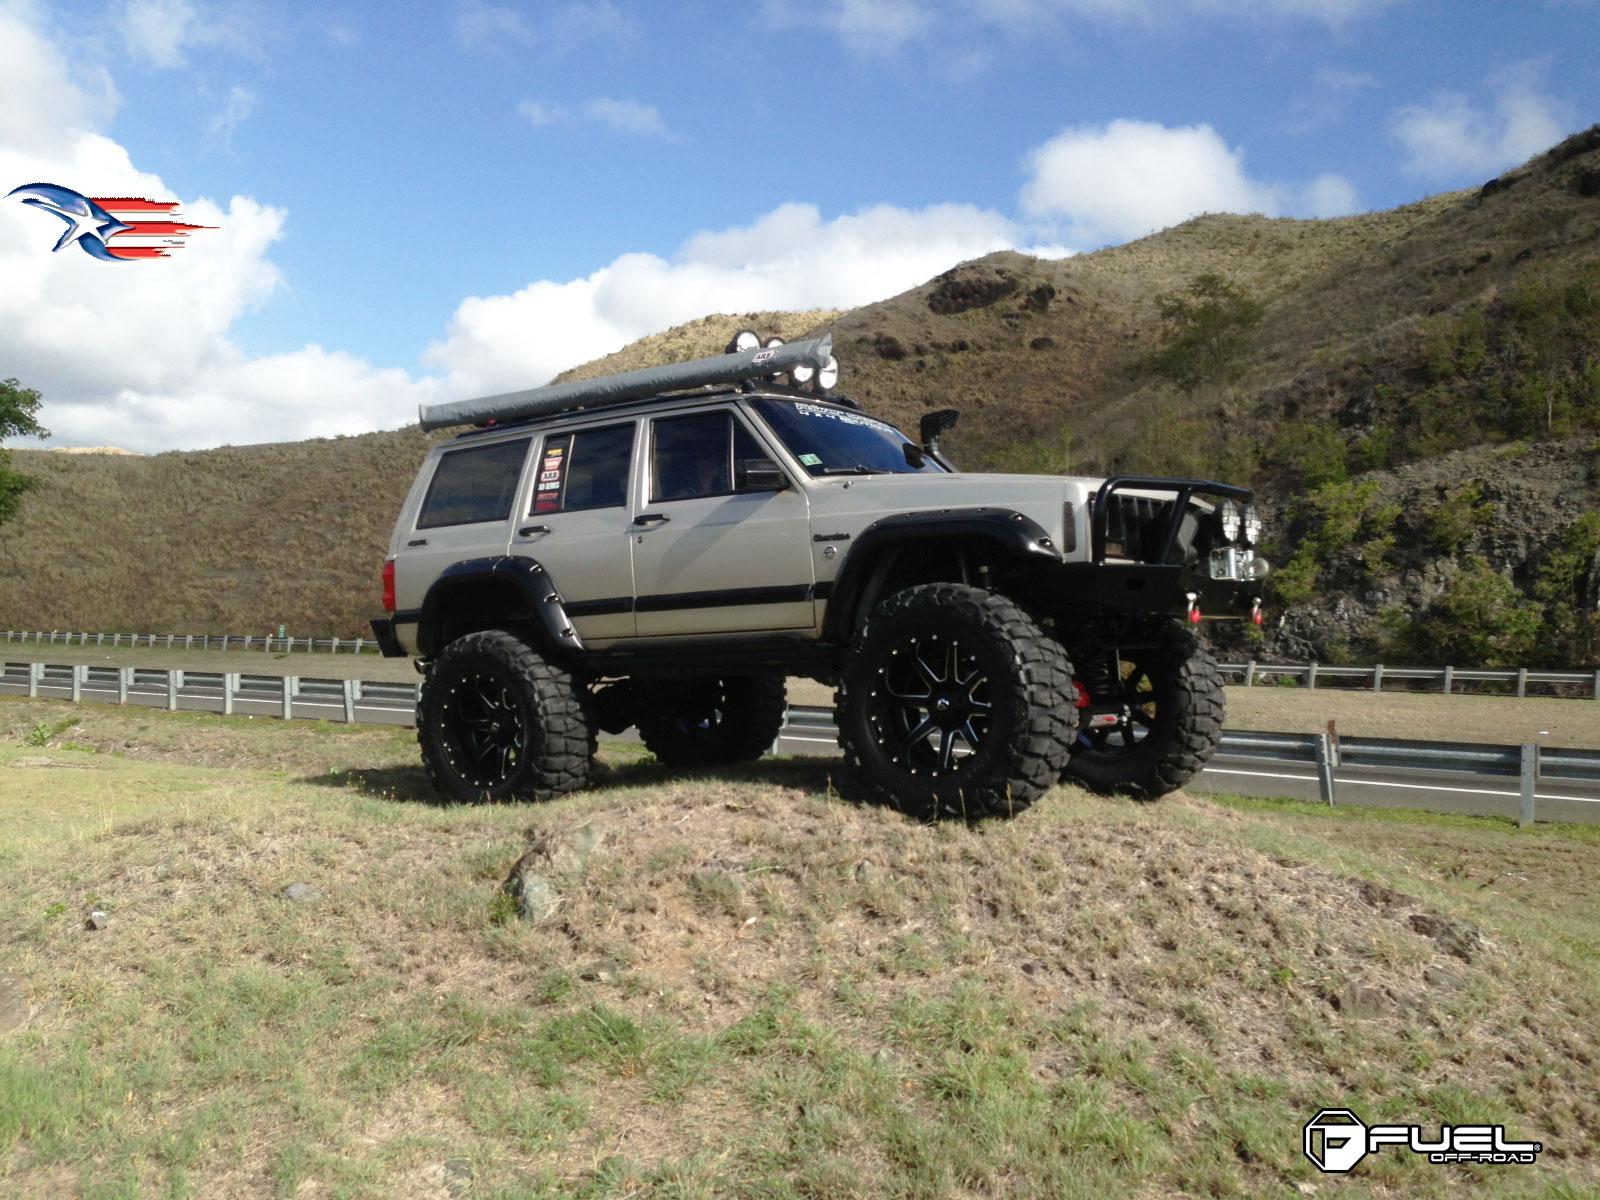 Toyota Dually Truck Jeep Cherokee Maverick - D262 Gallery - Fuel Off-Road Wheels